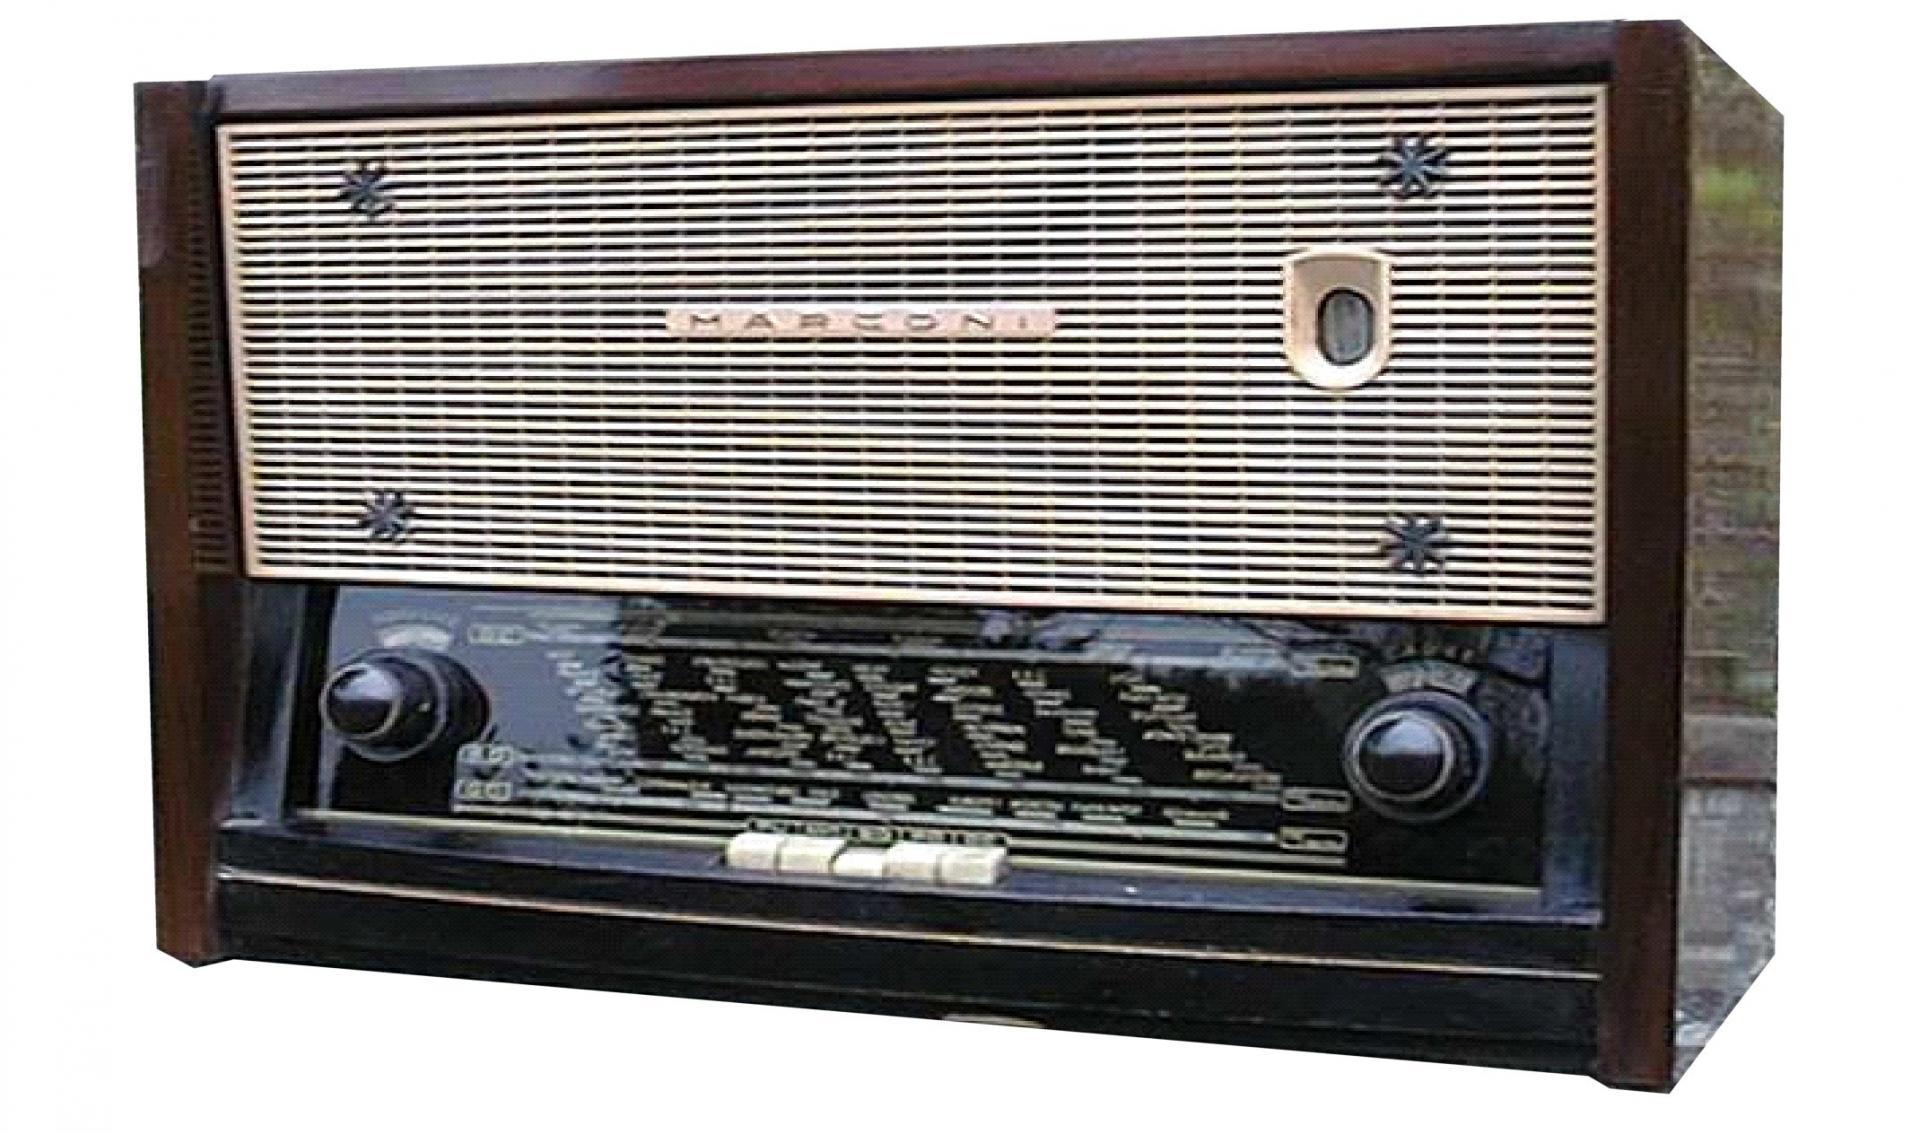 Marconi 656